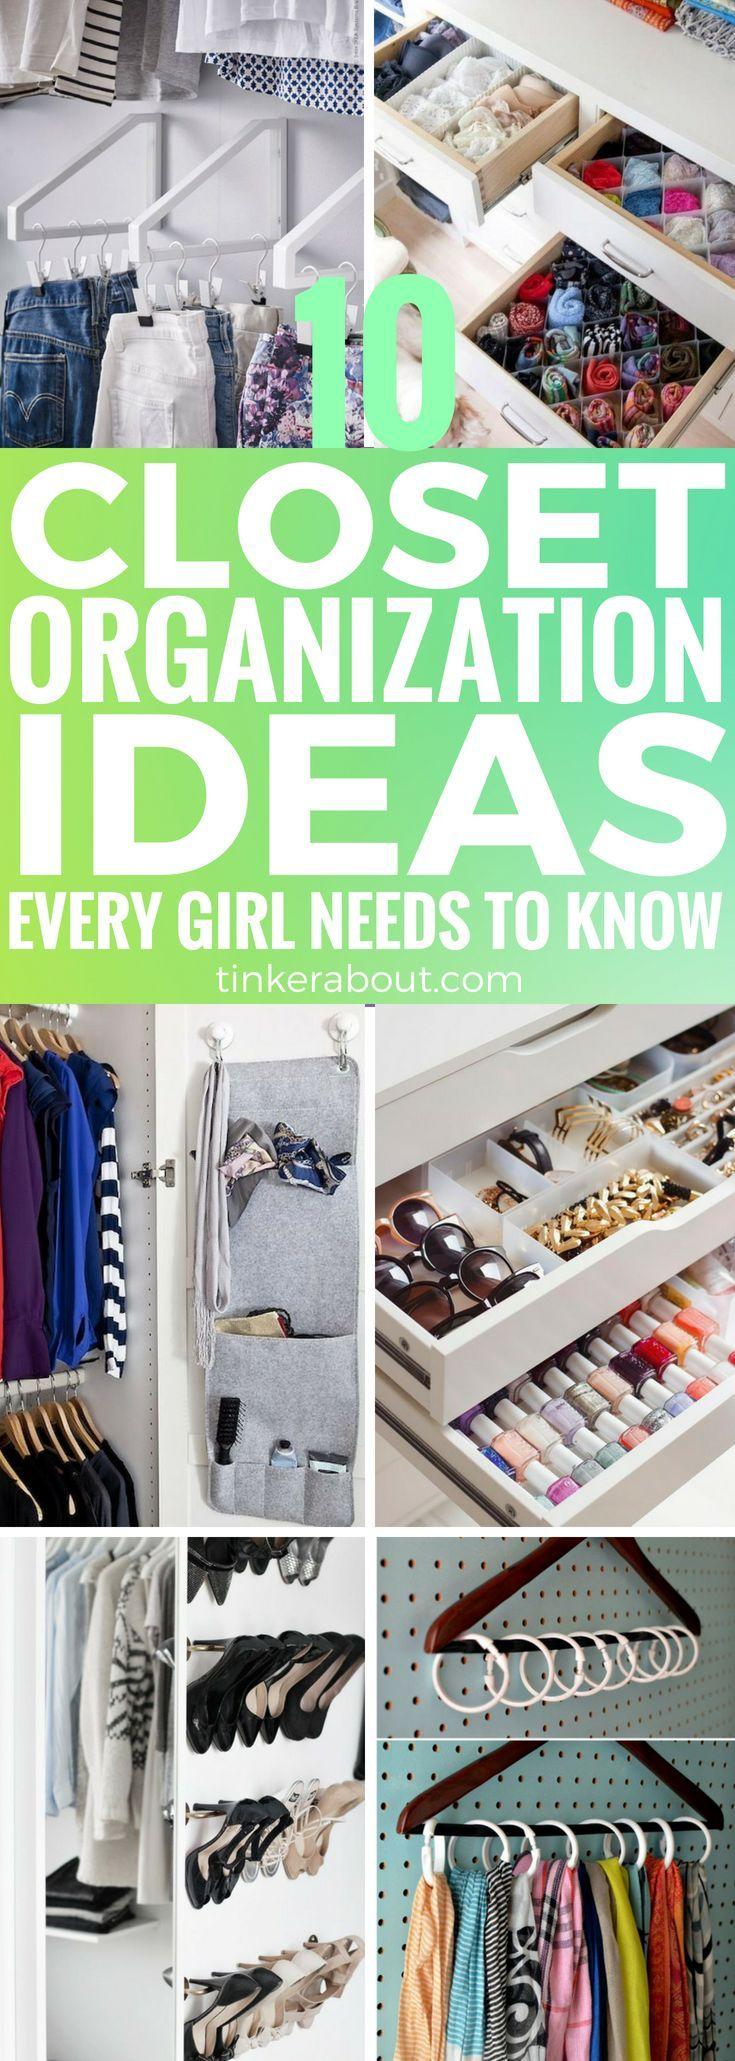 Closet Organization Ideas To Keep Your Bedroom Organized House